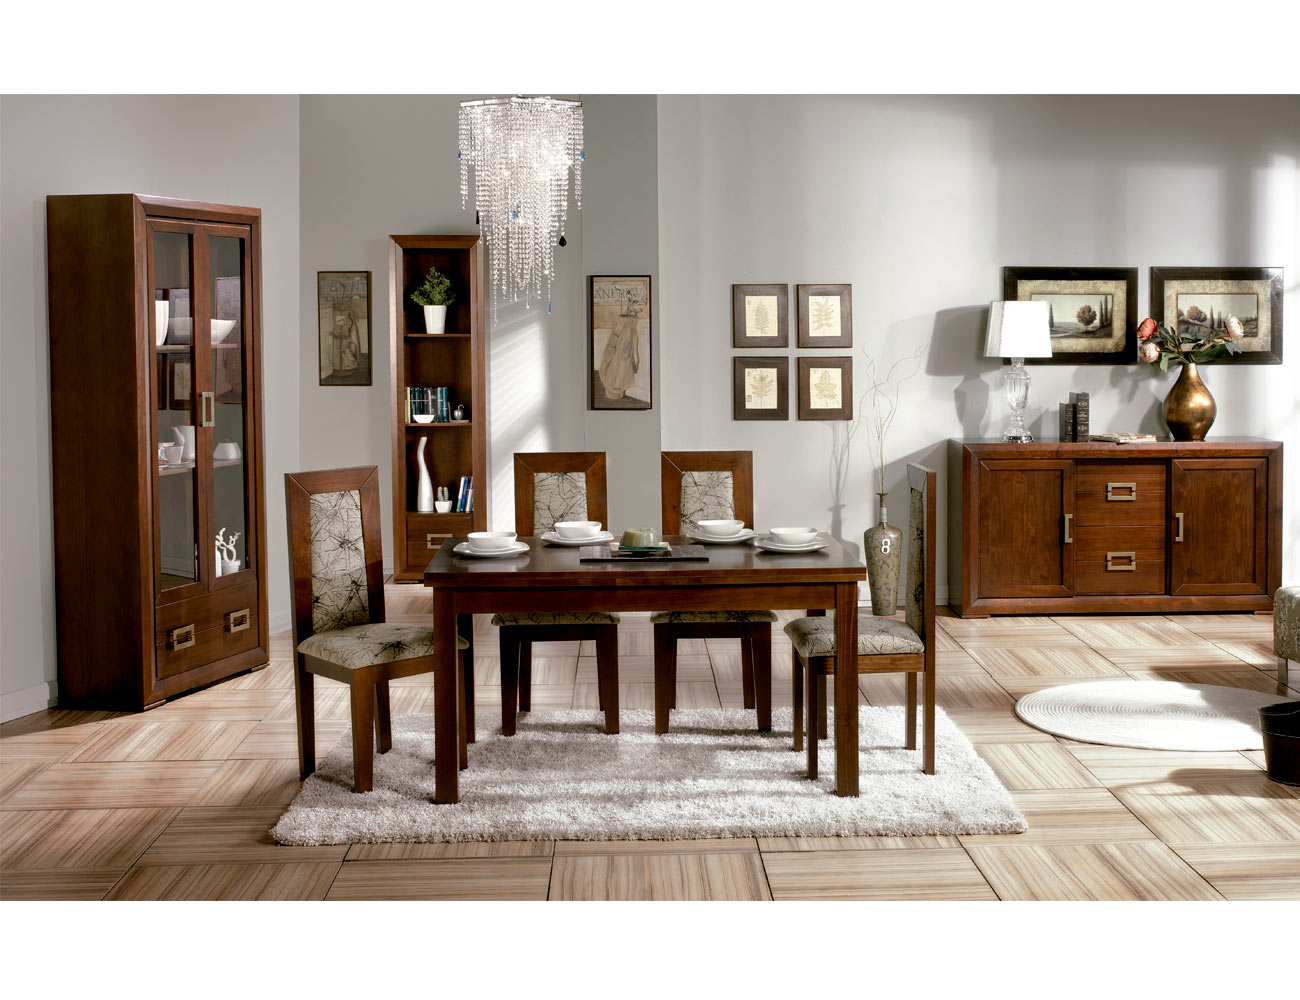 Composicion34 mueble salon comedor madera8